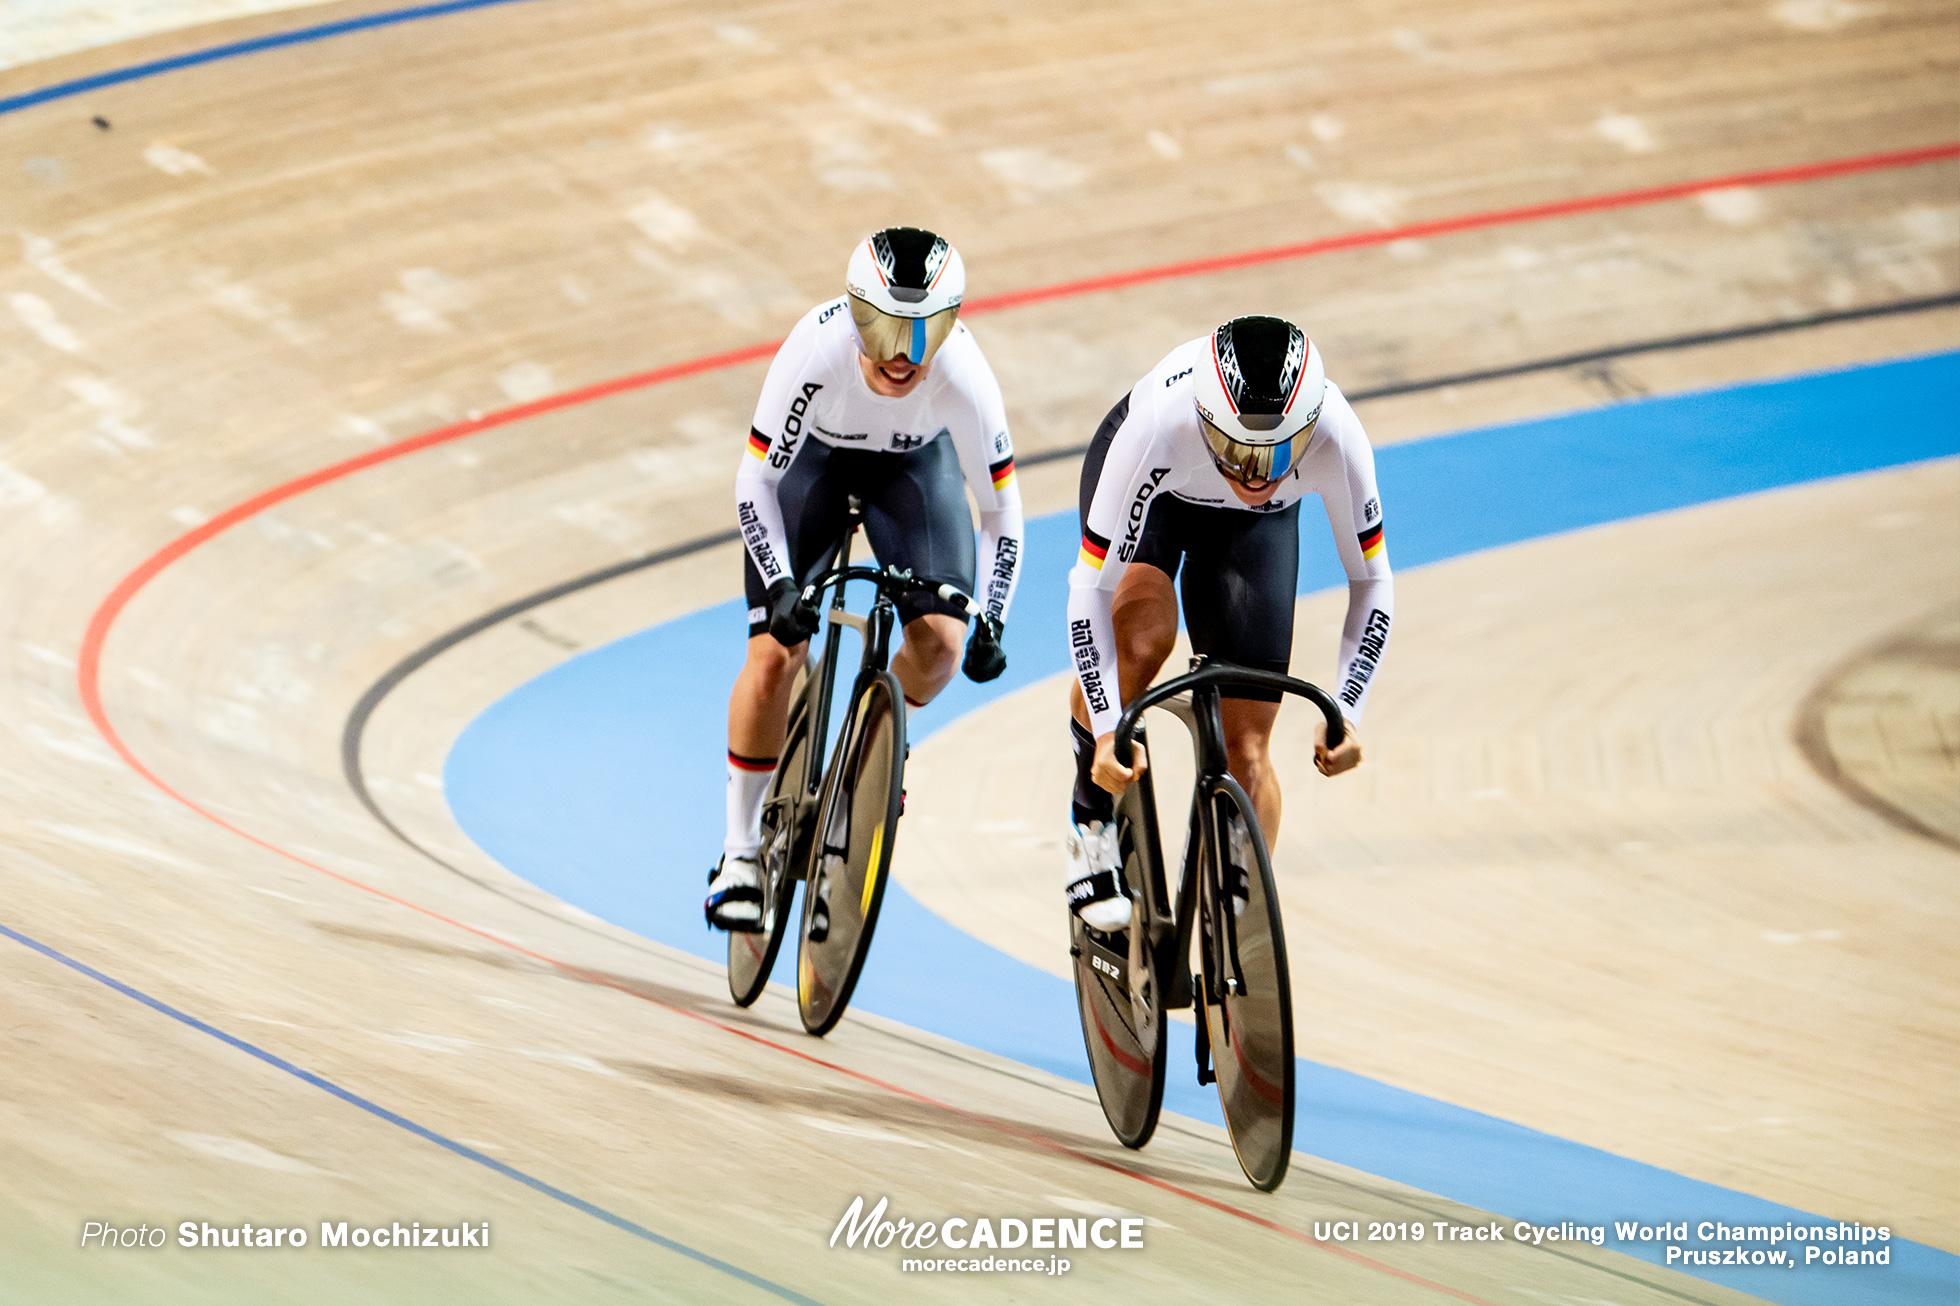 Women's Team Sprint Final / 2019 Track Cycling World Championships Pruszków, Poland